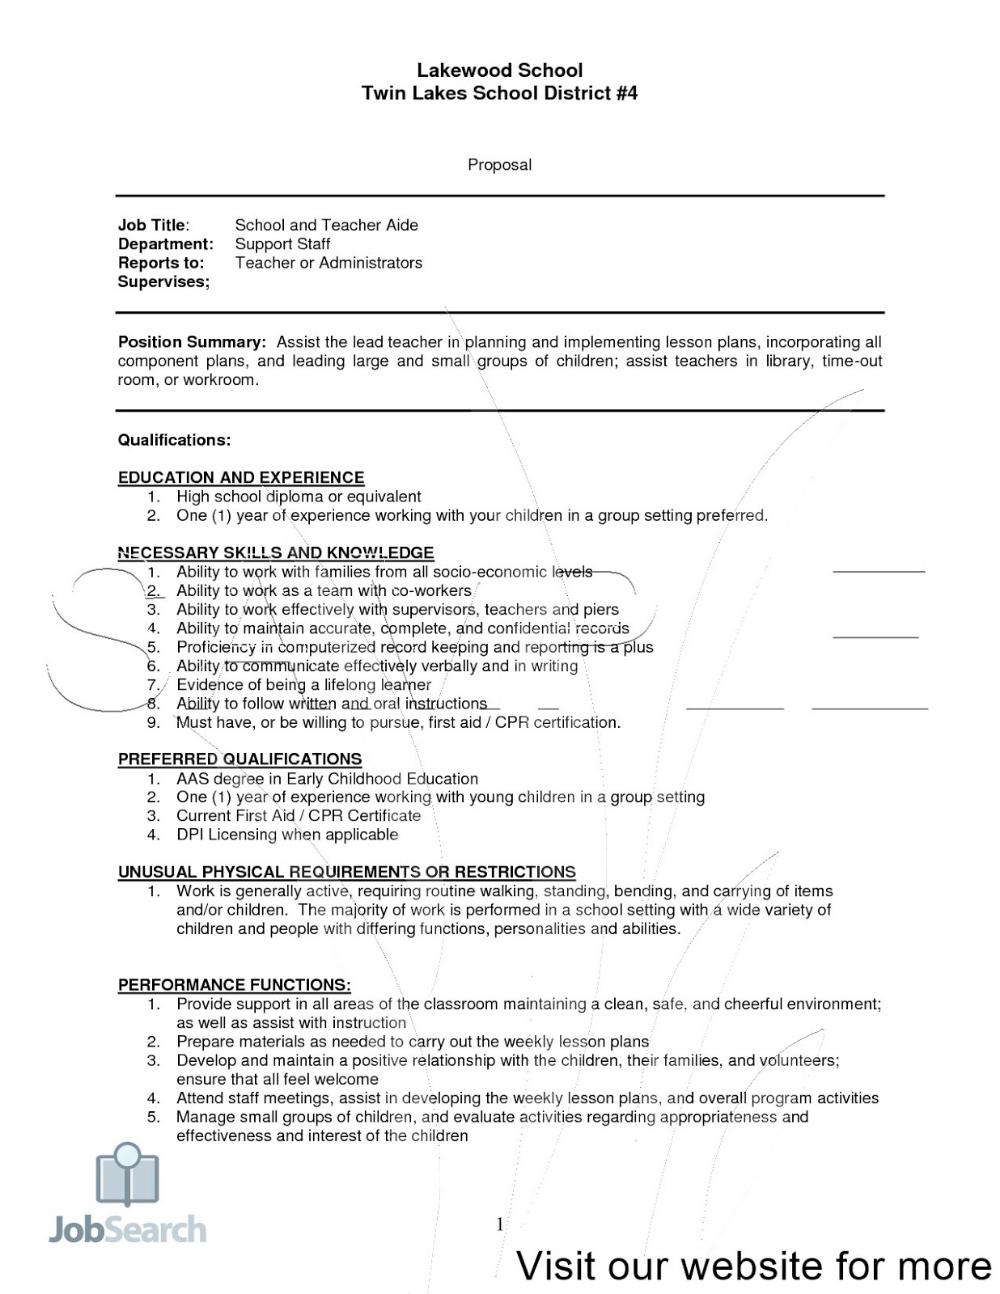 Preschool Teacher Resume Samples Free 2020 In 2020 Preschool Teacher Resume Teaching Resume Examples Teacher Resume